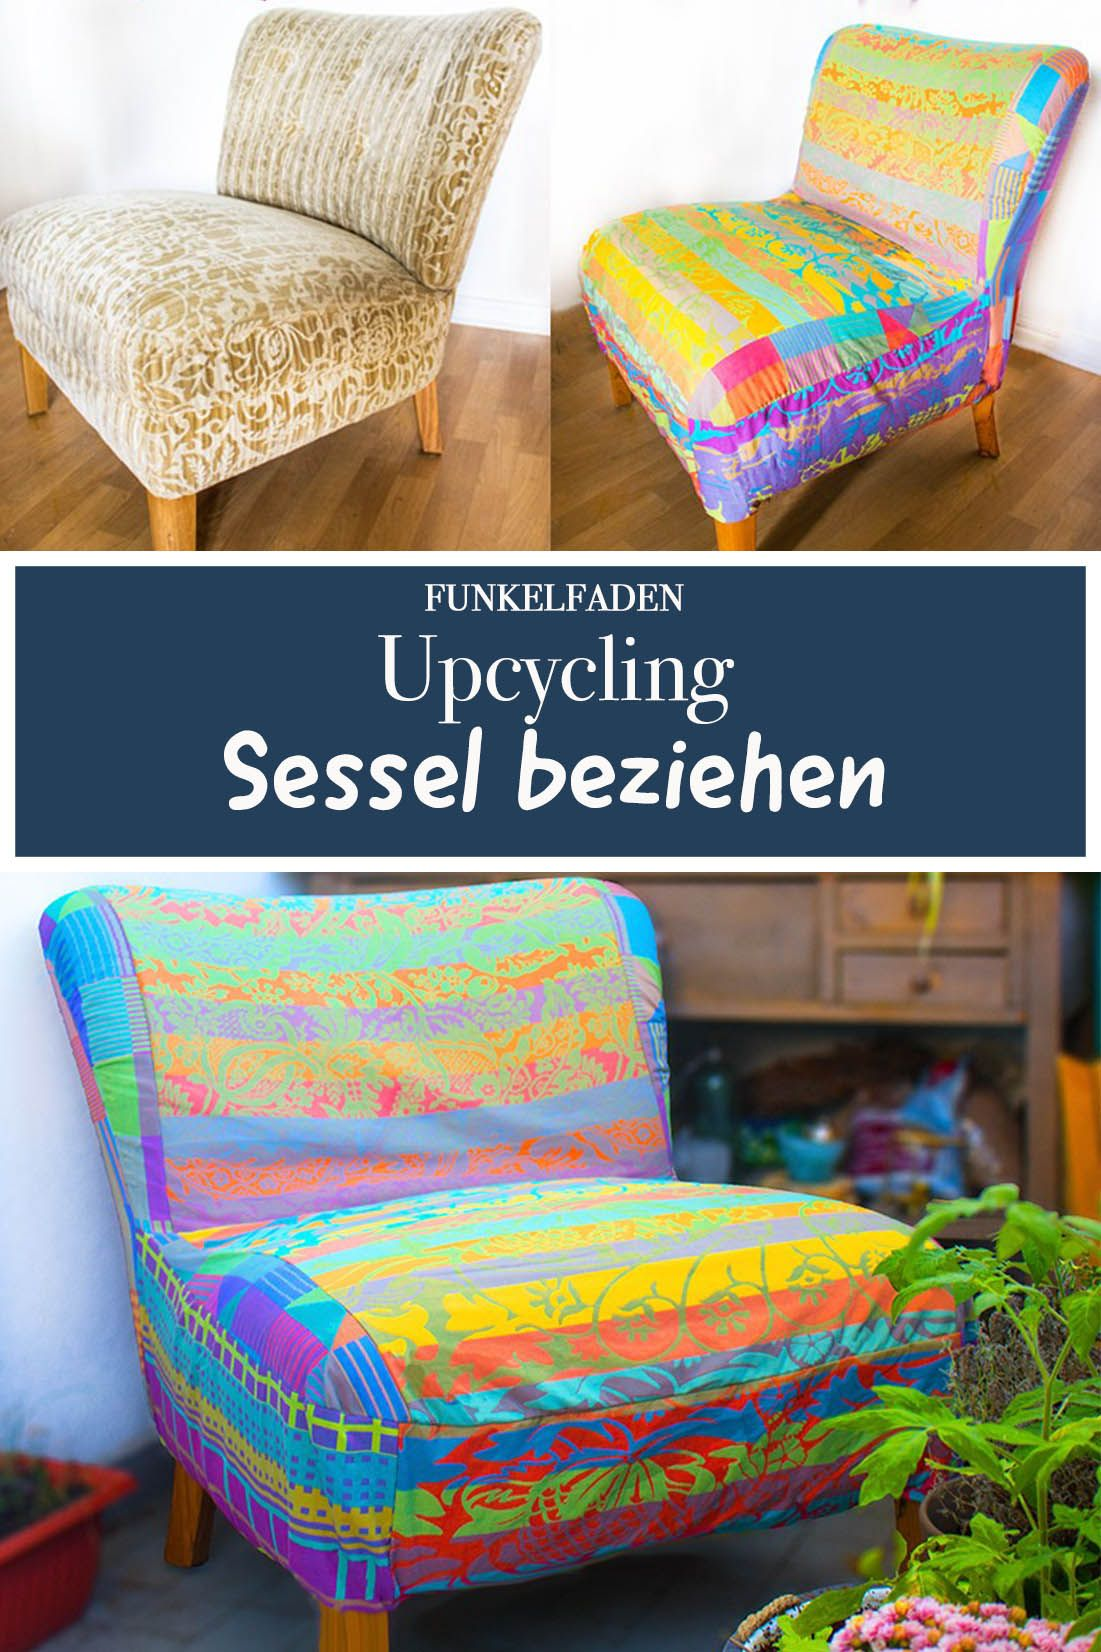 Upcycling Sessel Neu Beziehen Mit Polsterstoff Sessel Neu Beziehen Alter Sessel Karton Basteln